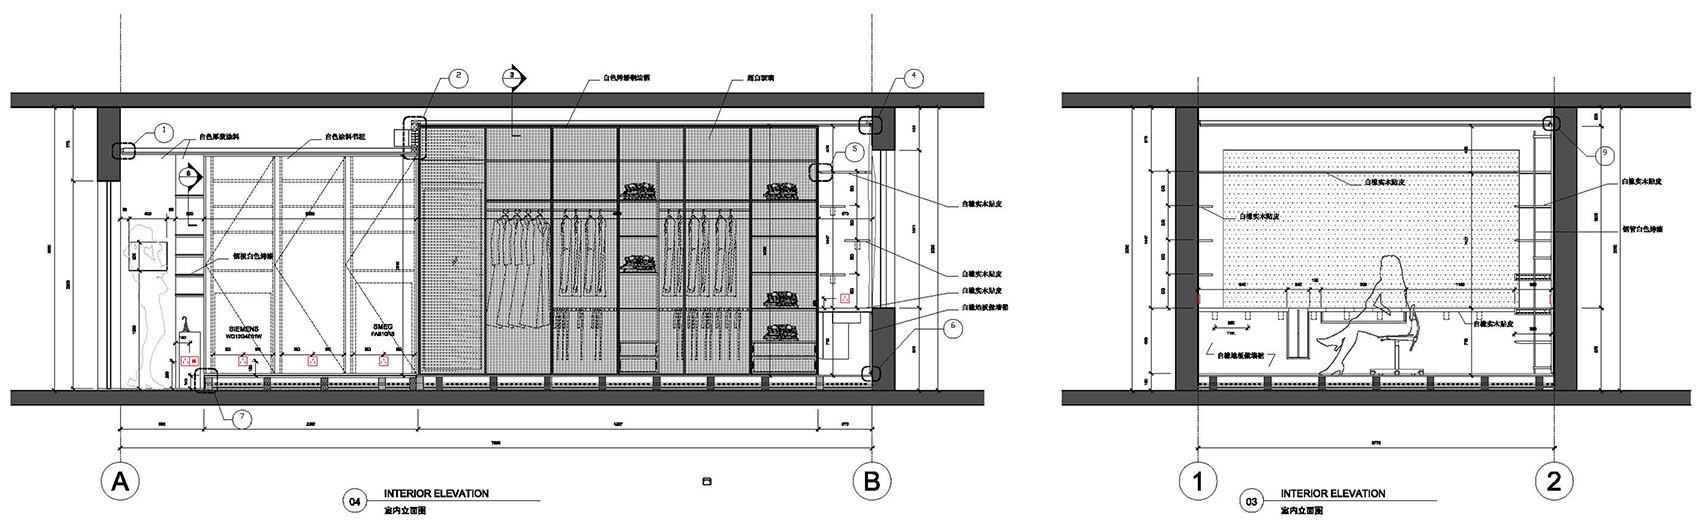 25-hana-house_YPYC-ARCHITECTS.jpg